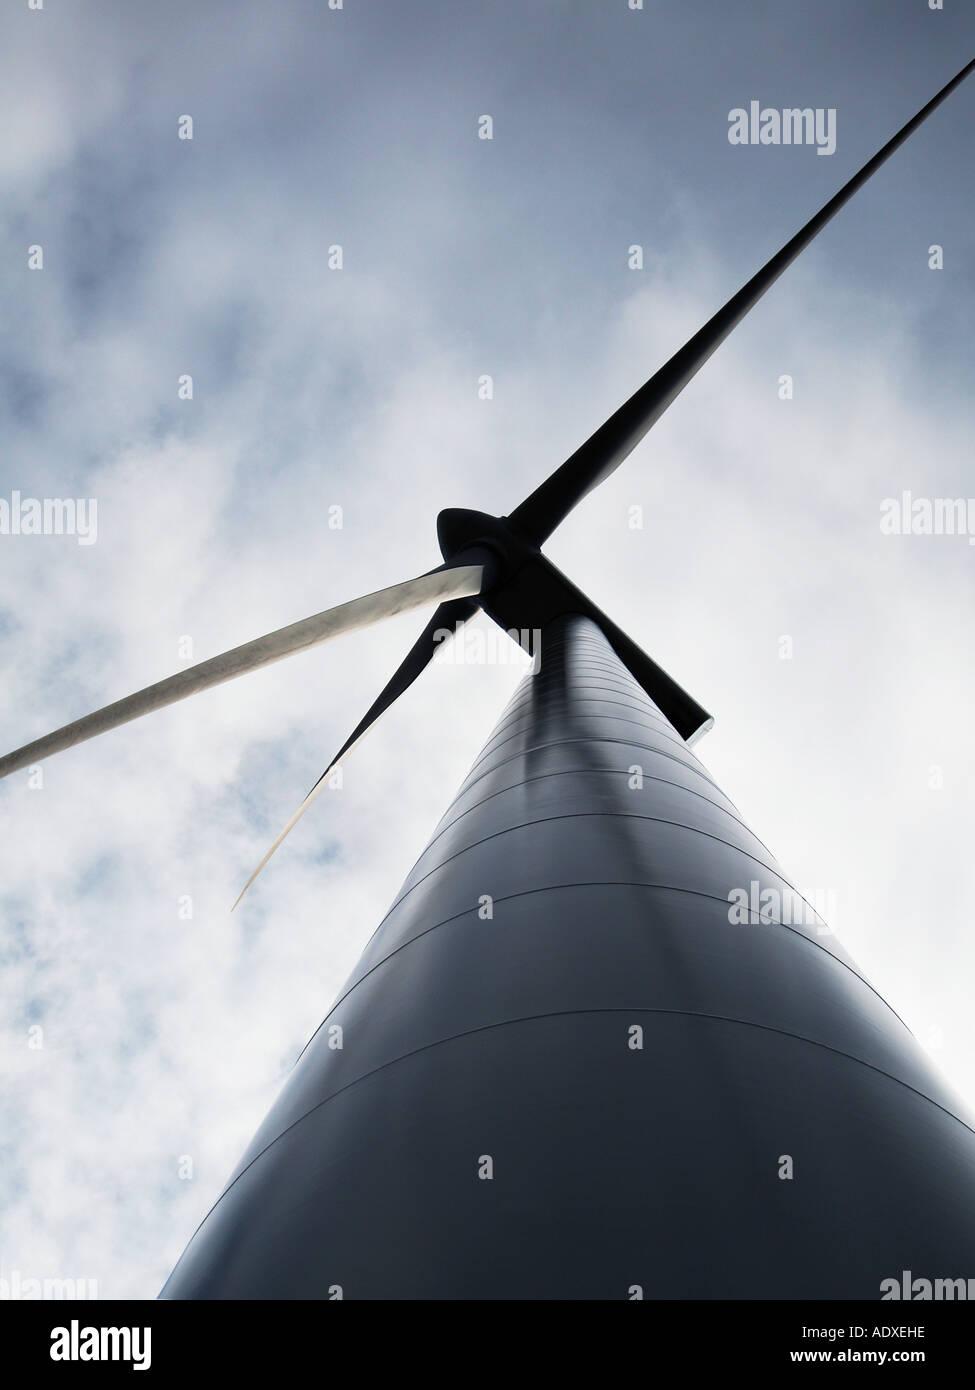 Wind turbine alternative energy wind power infinite resource clean Rotterdam the Netherlands - Stock Image